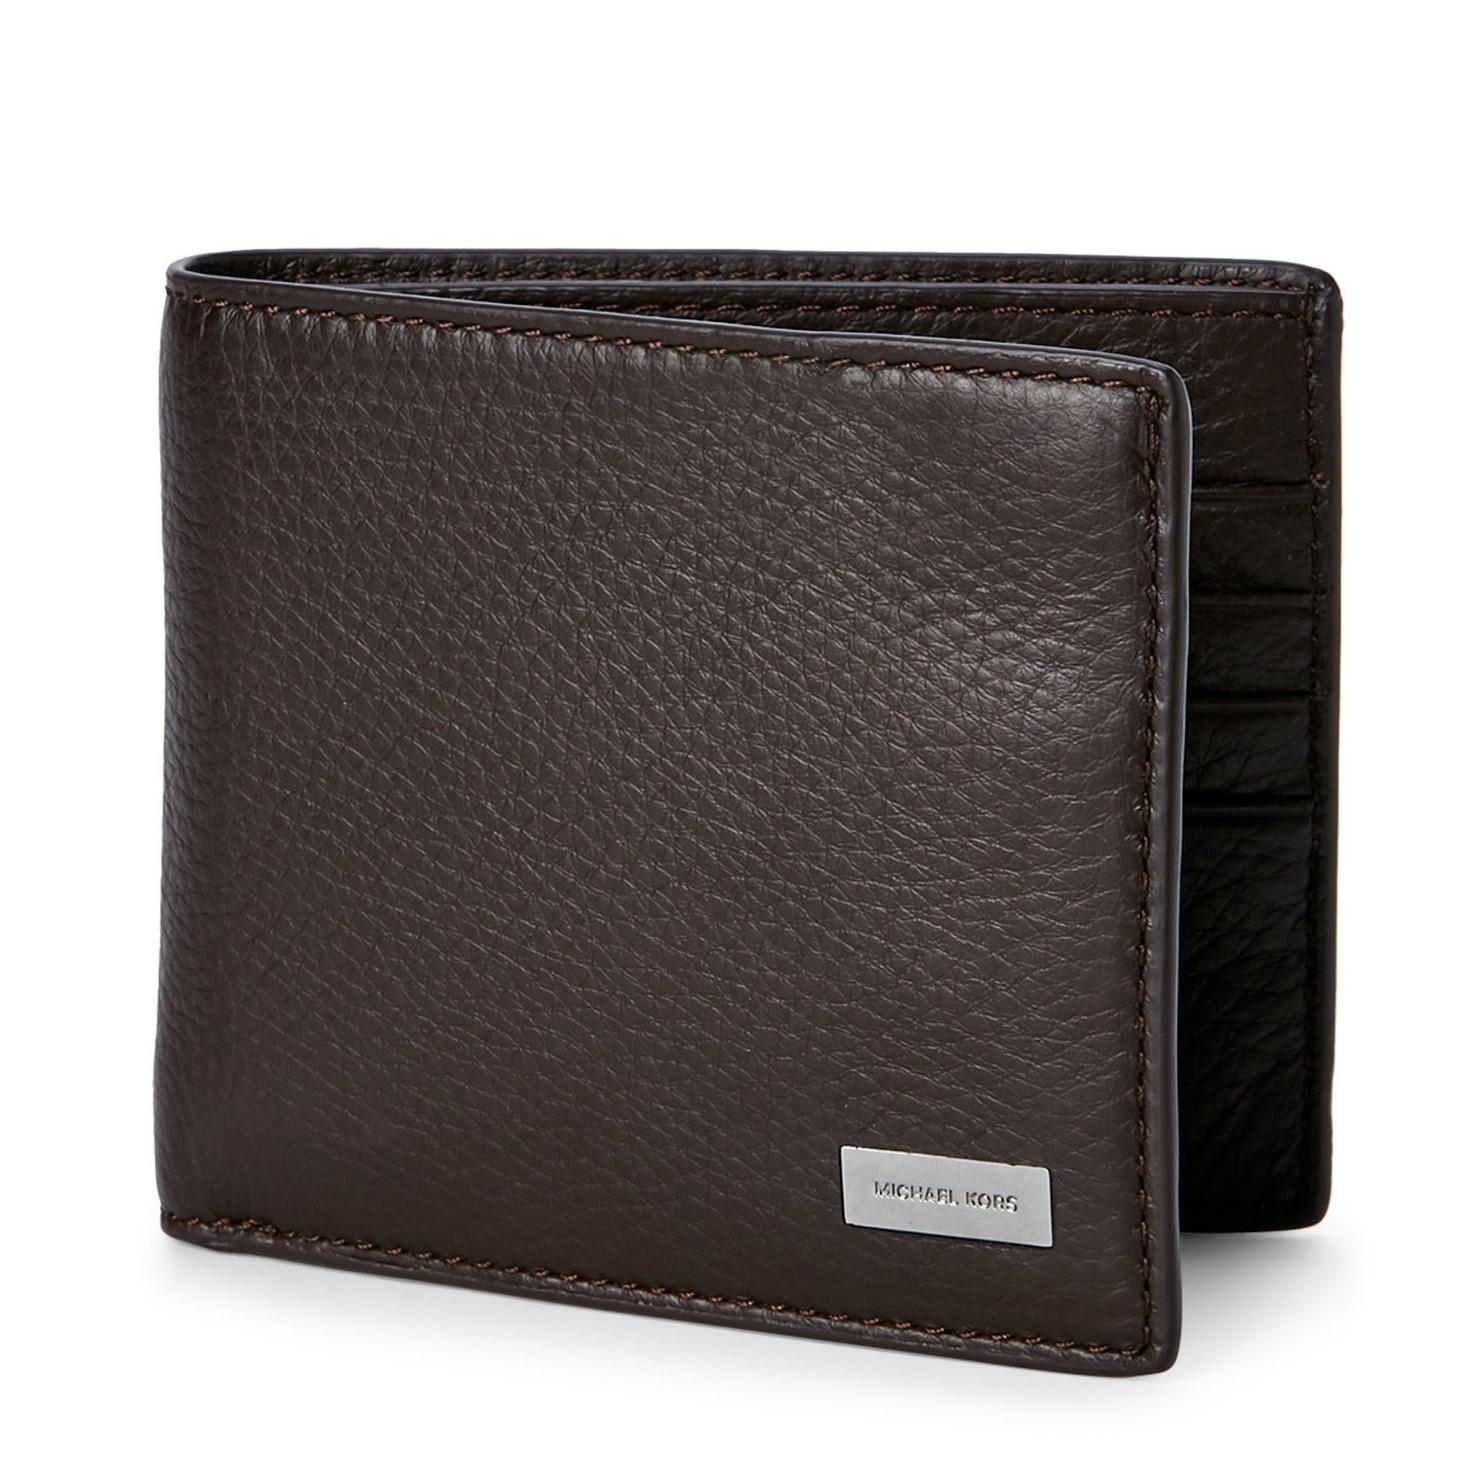 48a76d24f7f Meeste rahakotid - Michael Kors rahakott MK48032